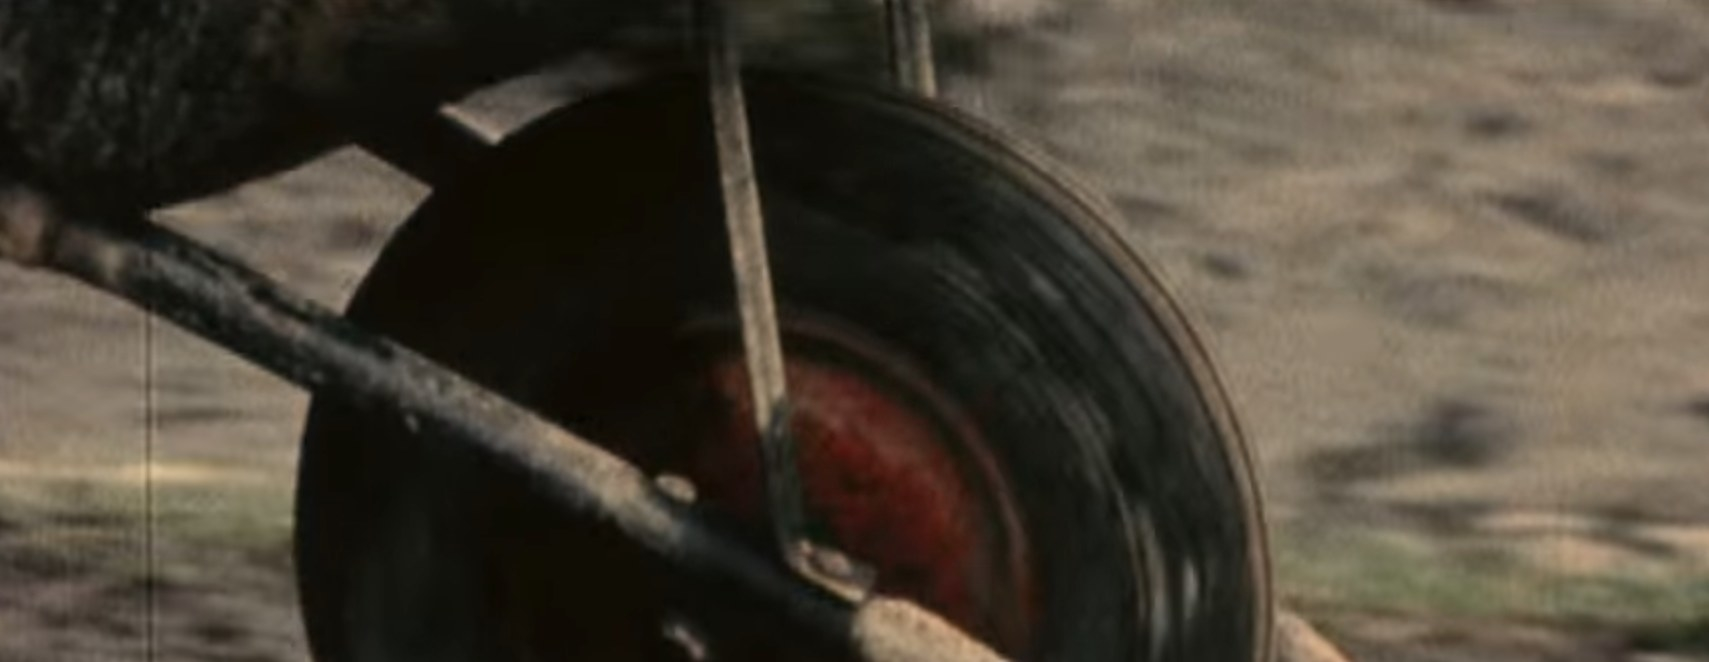 Wheel of a wheelbarrow.